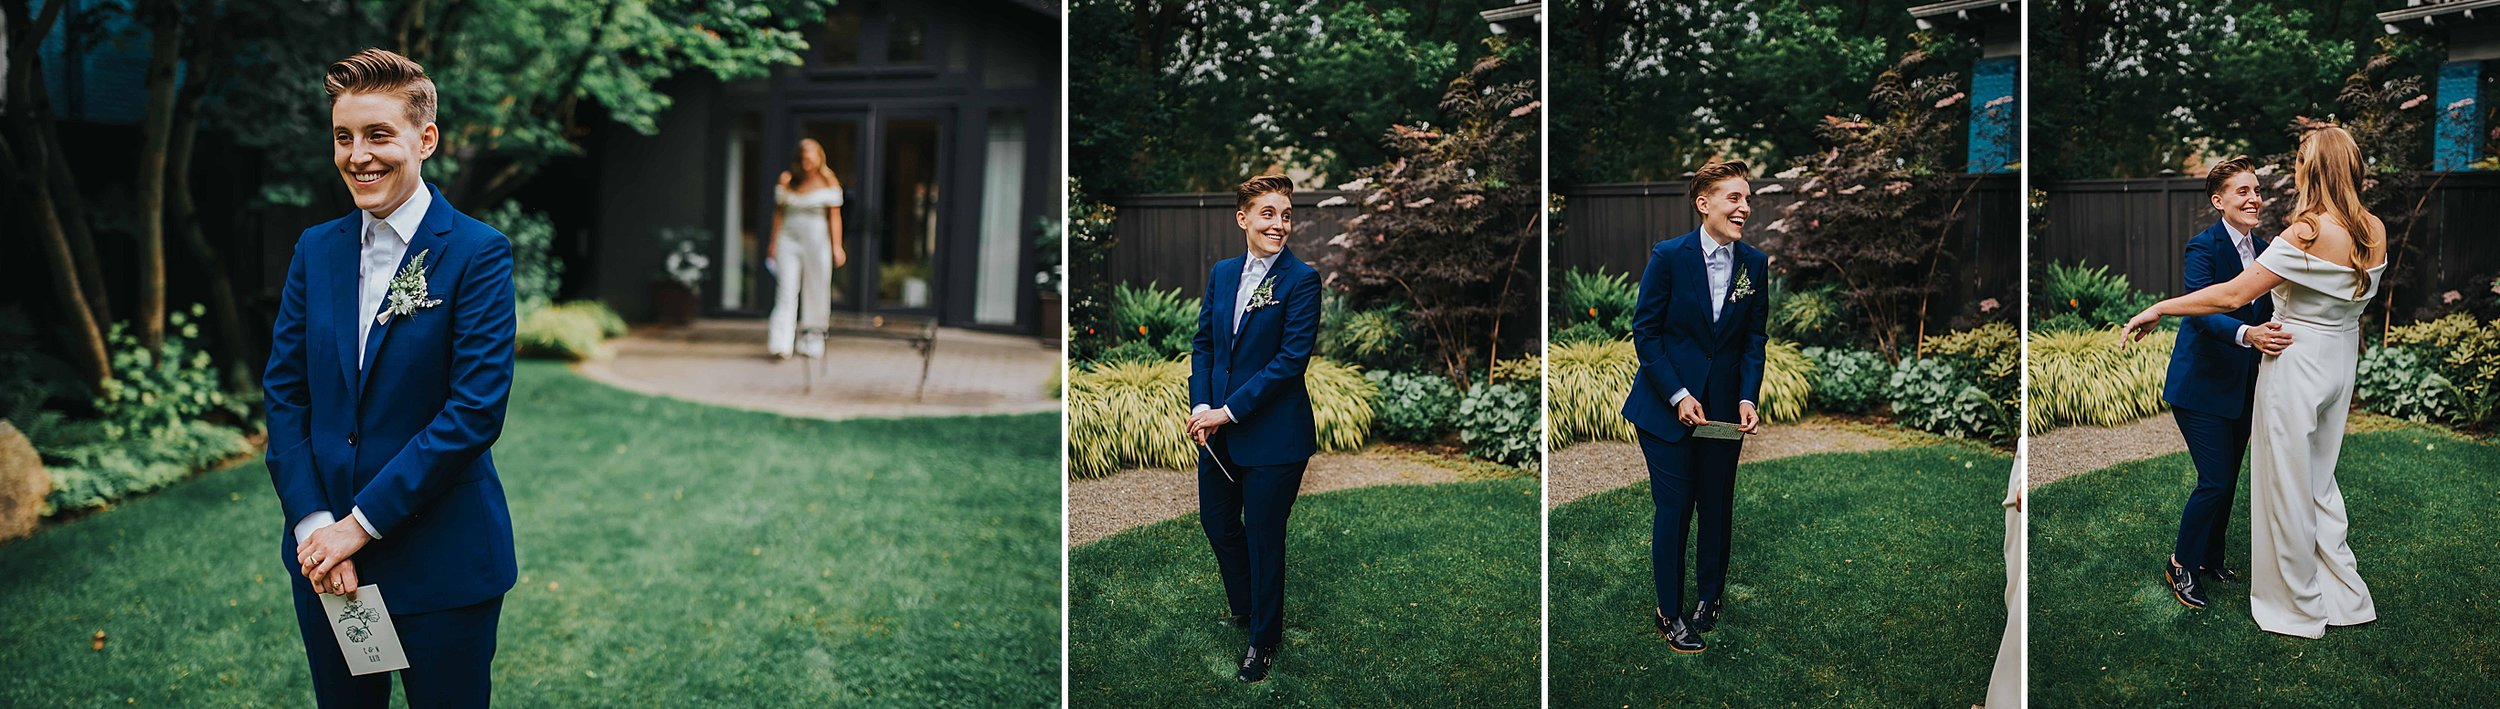 Seattle-Wedding-photographer-J HODGES PHOTOGRAPHY_0320.jpg